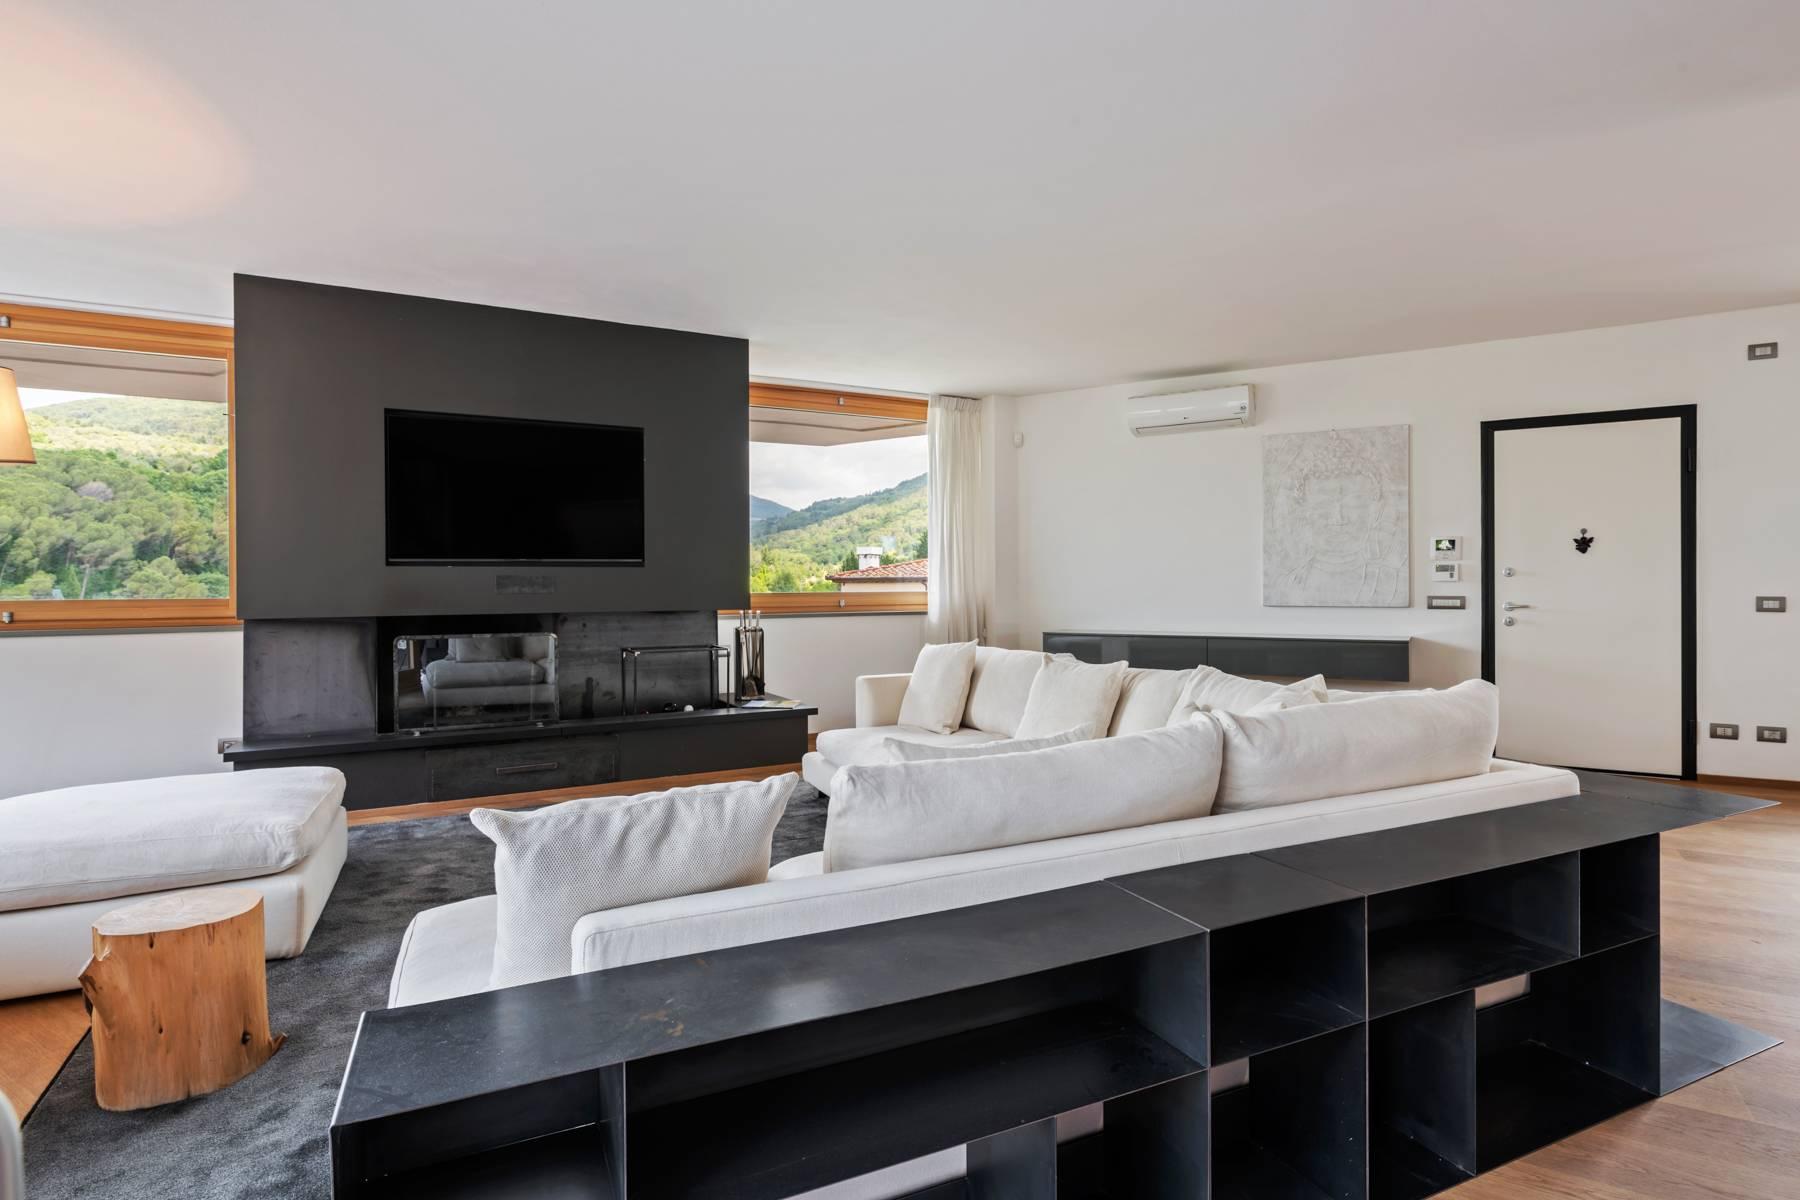 Appartamento in Vendita a Pontassieve: 5 locali, 300 mq